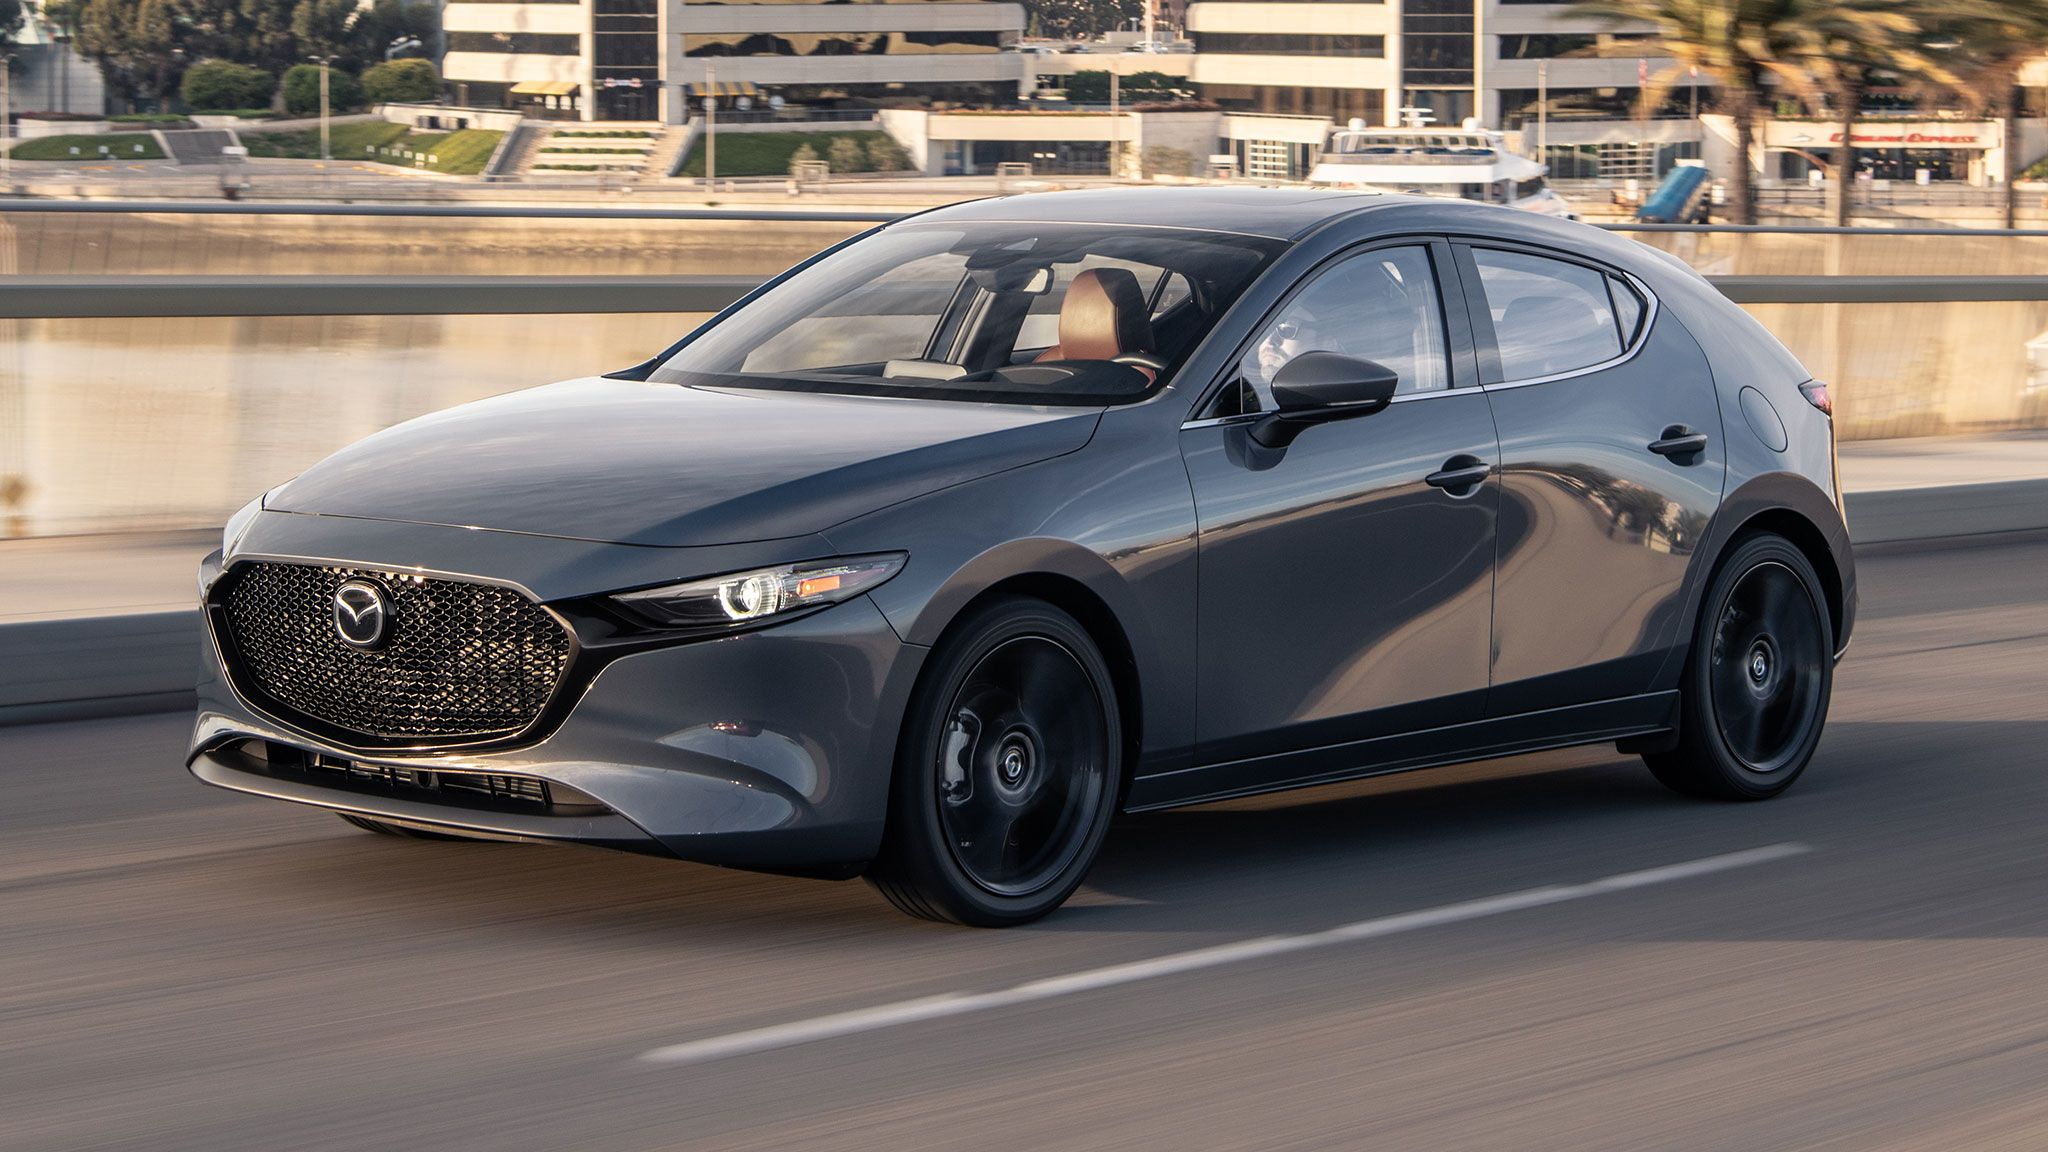 Mazda Teases Turbocharged 3 Teased Prior To July 8th Reveal Mazda Sports Sedan Sport Seats